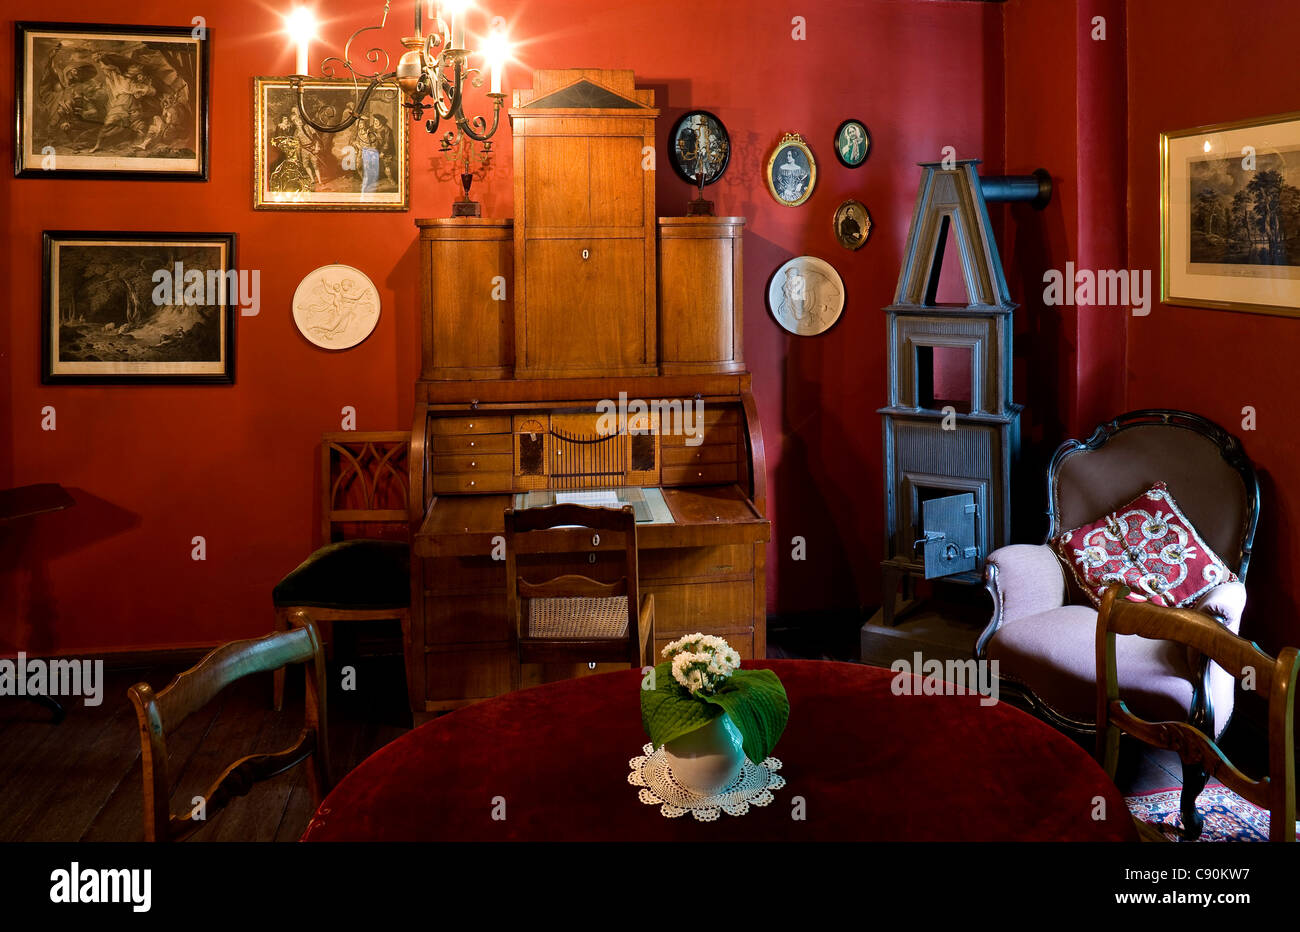 Theodor Storm Stockfotos & Theodor Storm Bilder Alamy